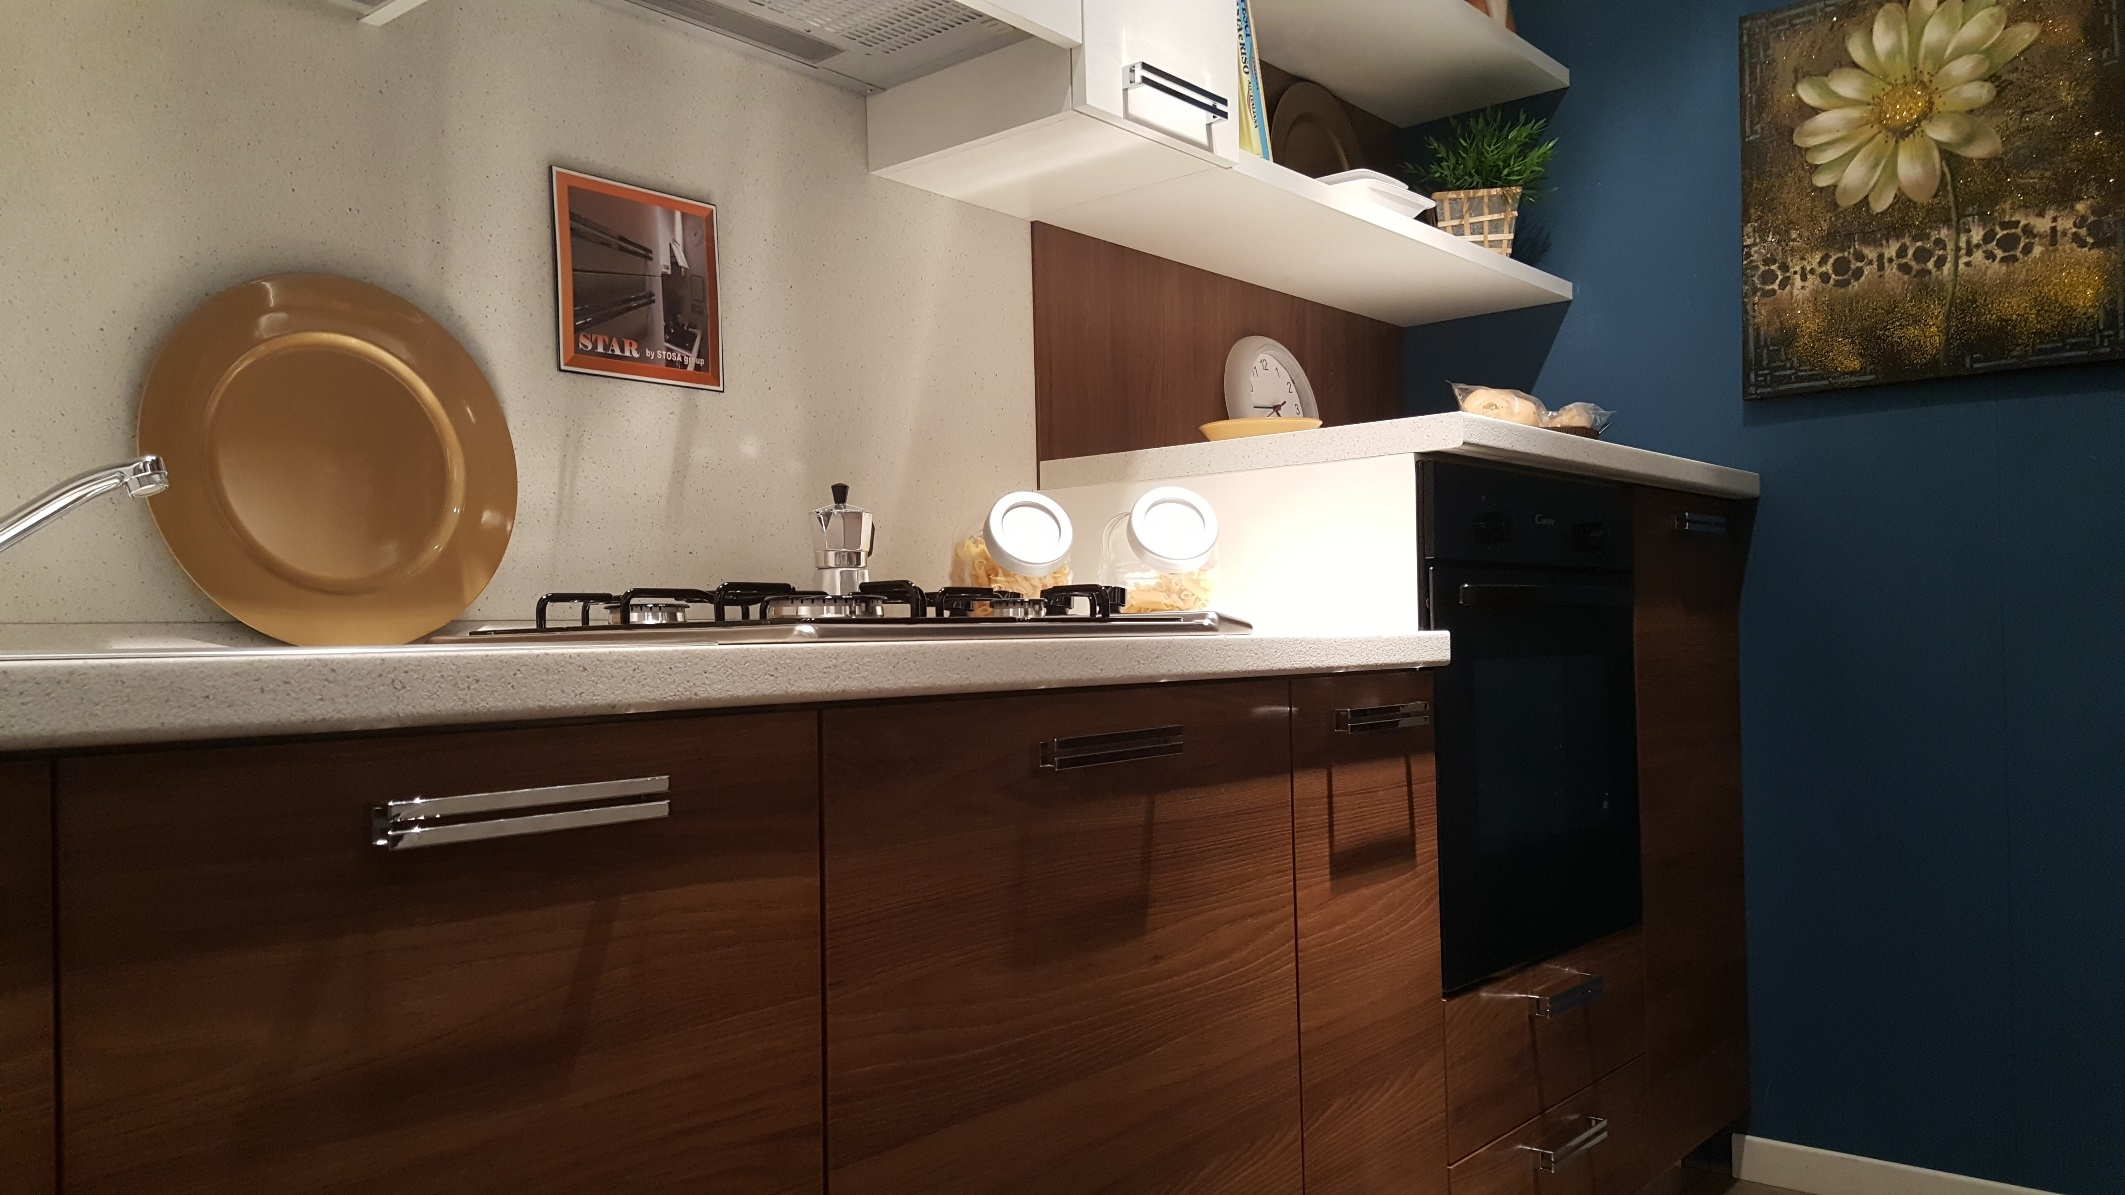 Cucine Low Cost Roma. Amazing Cucine Artigianali Su Misura With ...